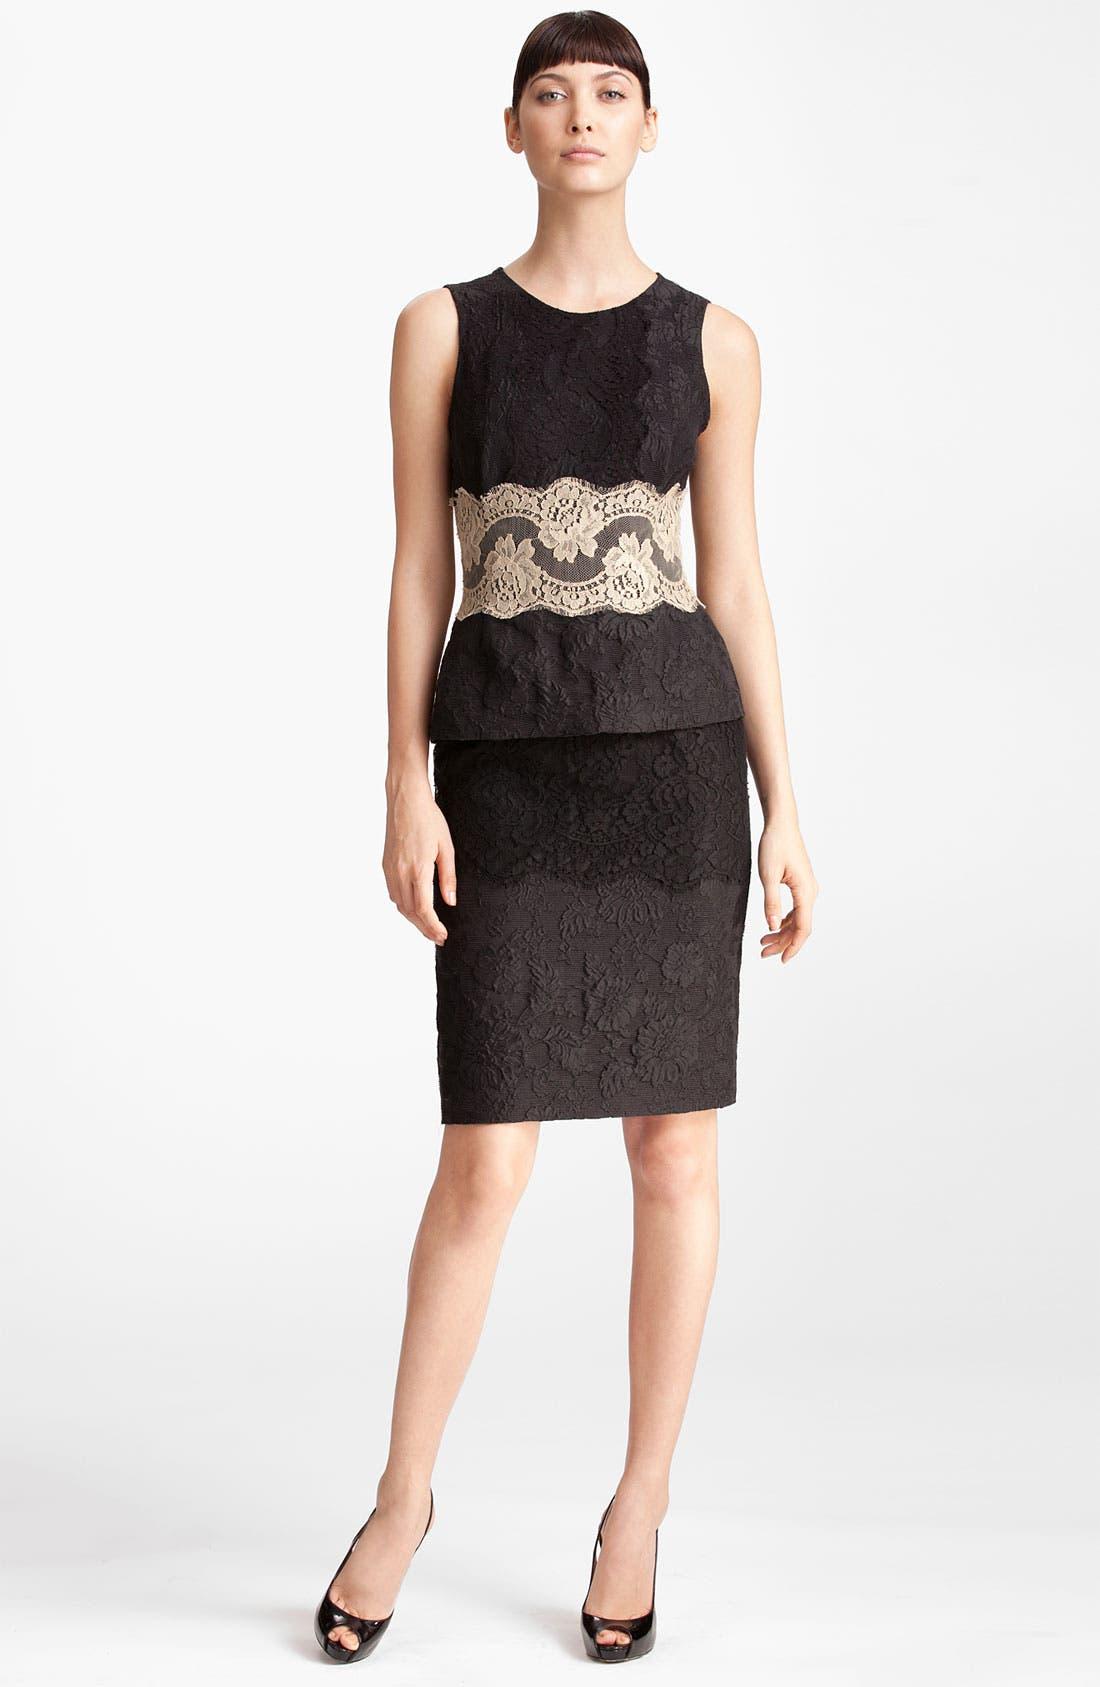 Alternate Image 1 Selected - Dolce&Gabbana Contrast Lace & Jacquard Peplum Dress